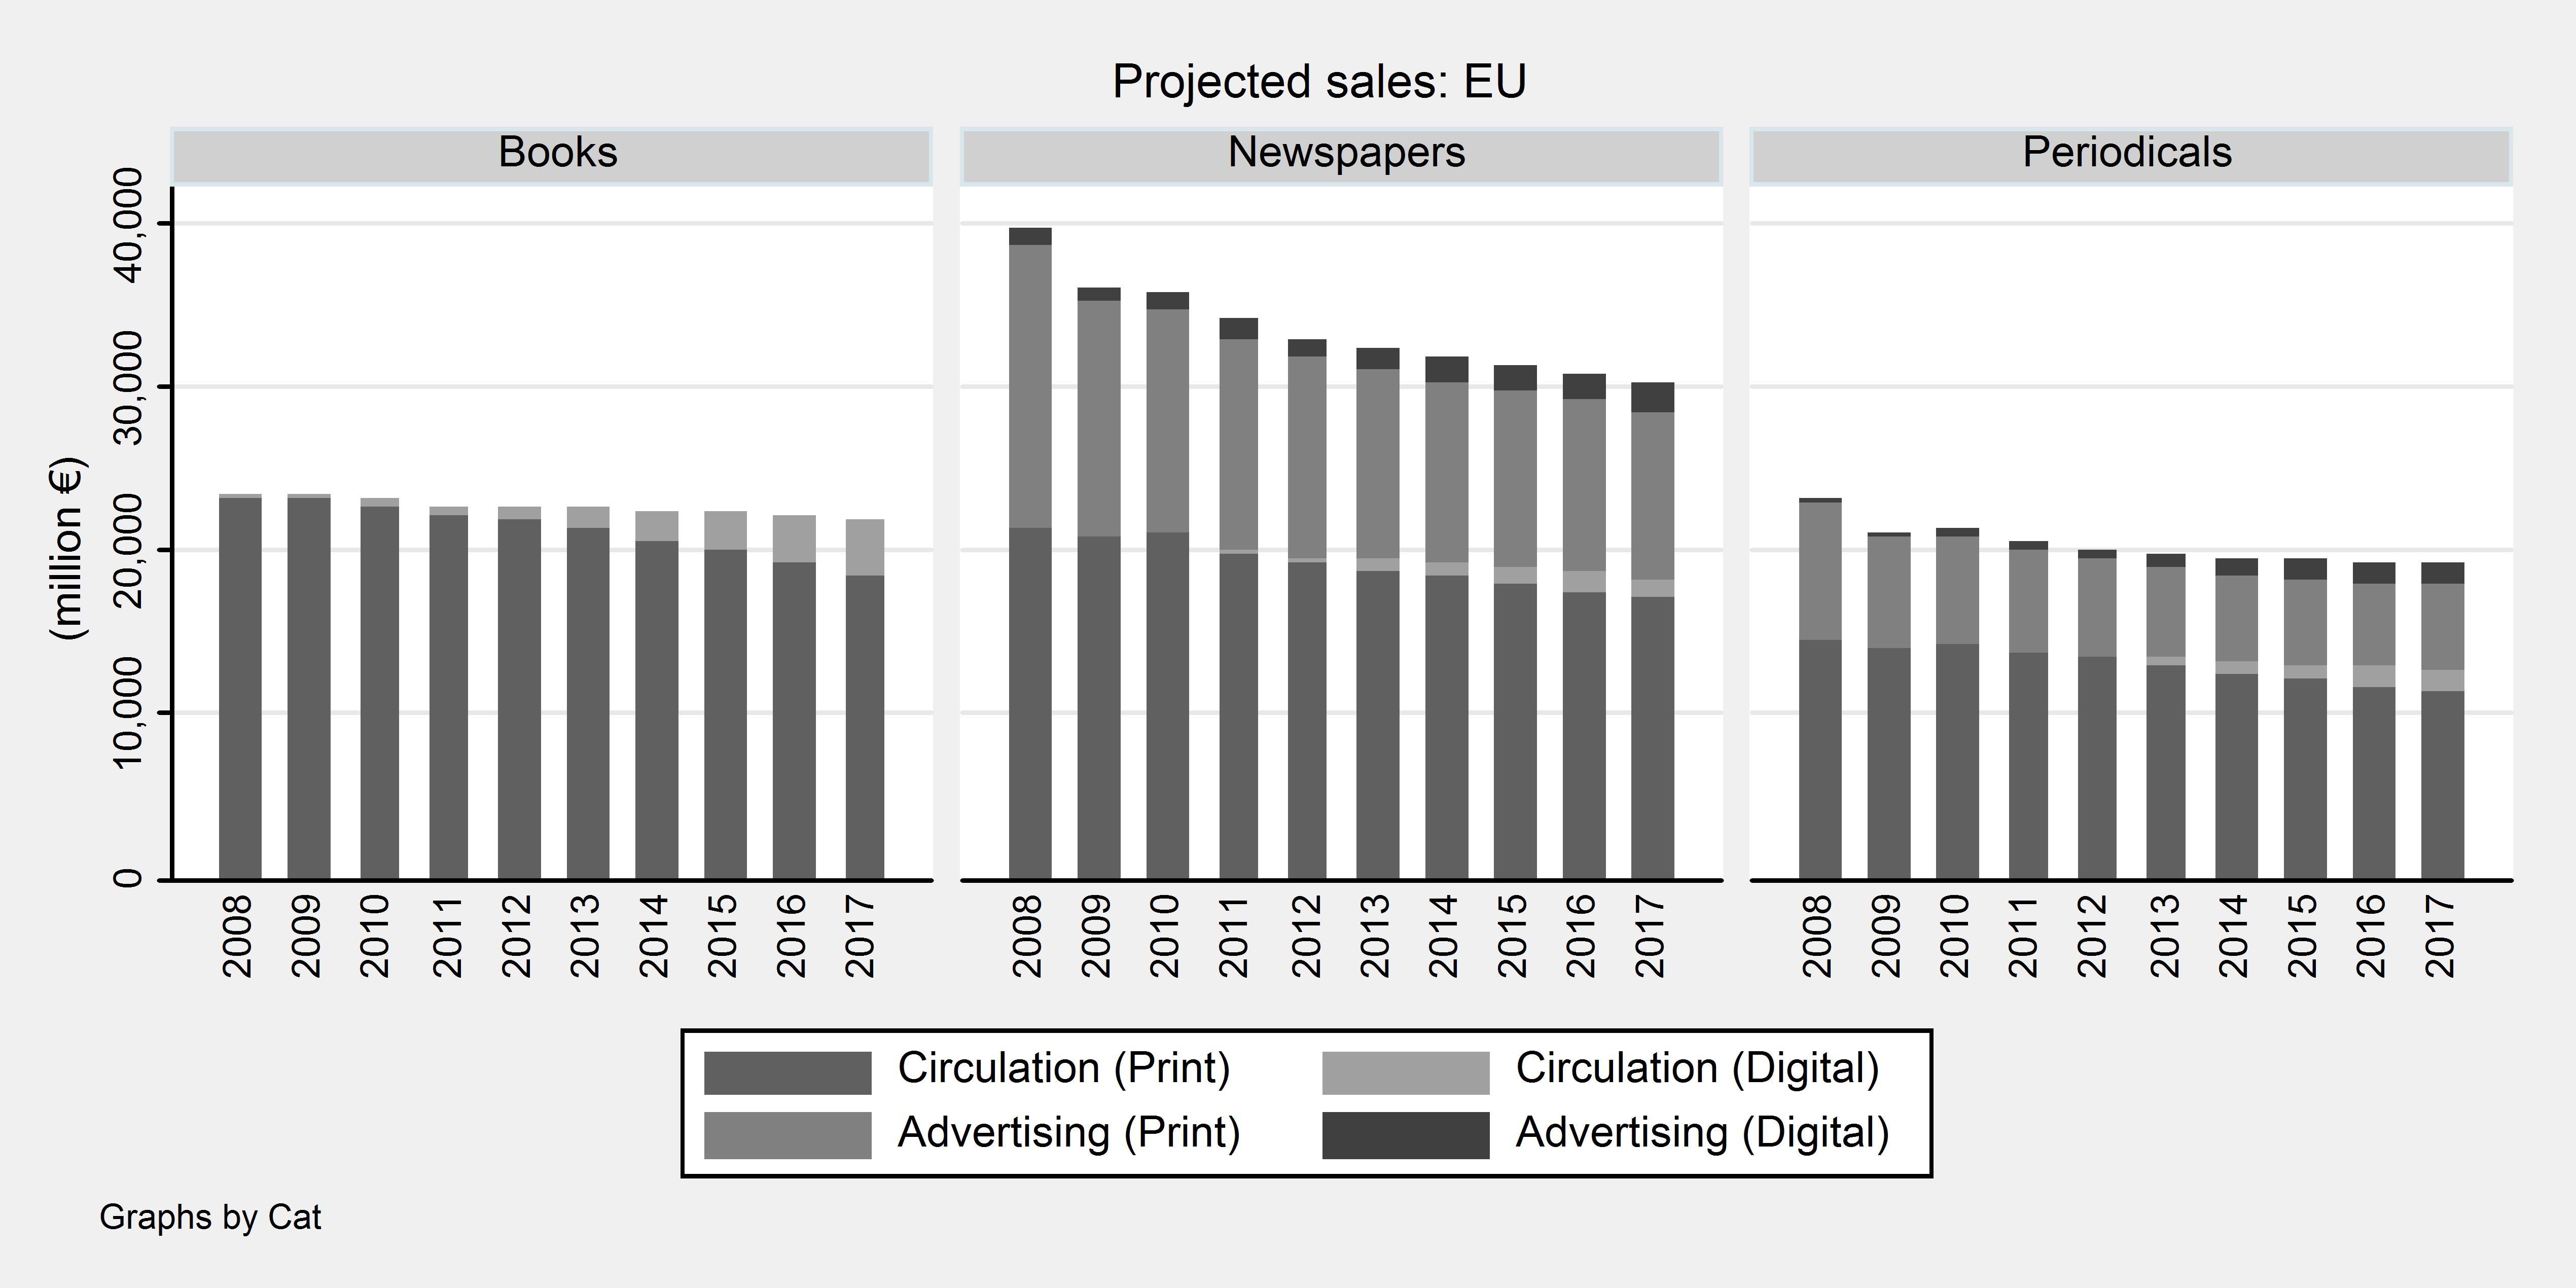 Eur lex 52016sc0392 en eur lex table 5 expenditure by sector and source of revenue fandeluxe Choice Image